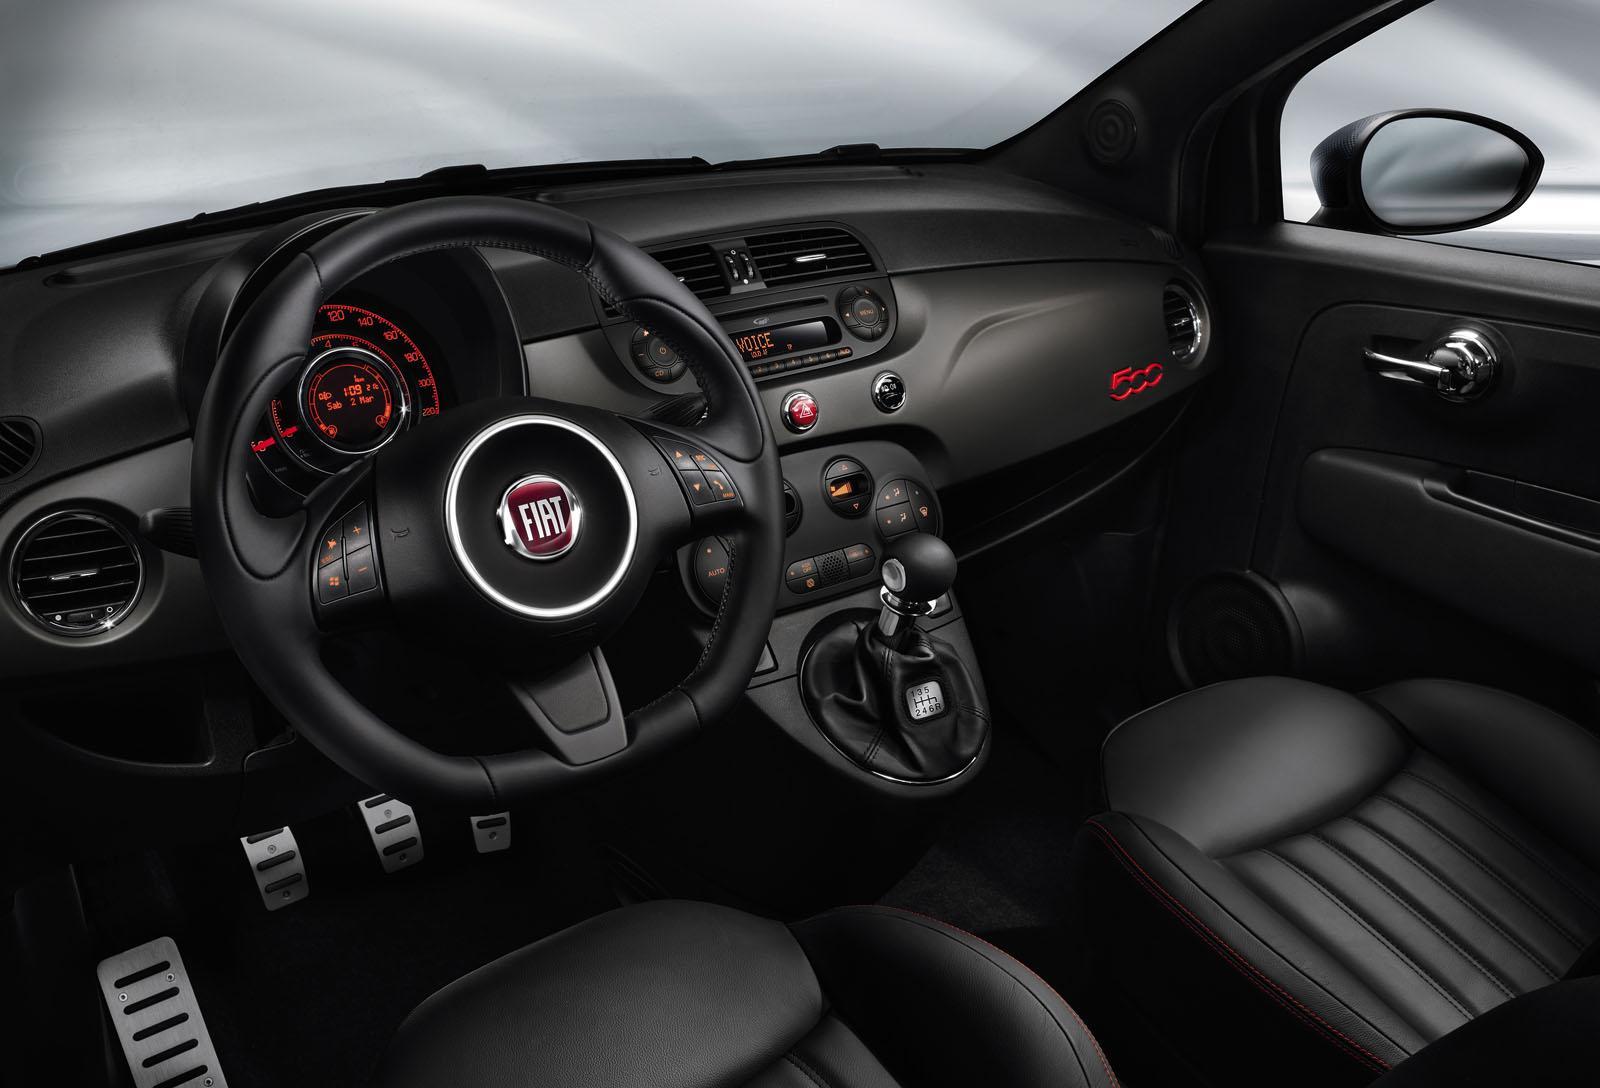 2013 Fiat 500 Gq Edition In Geneva